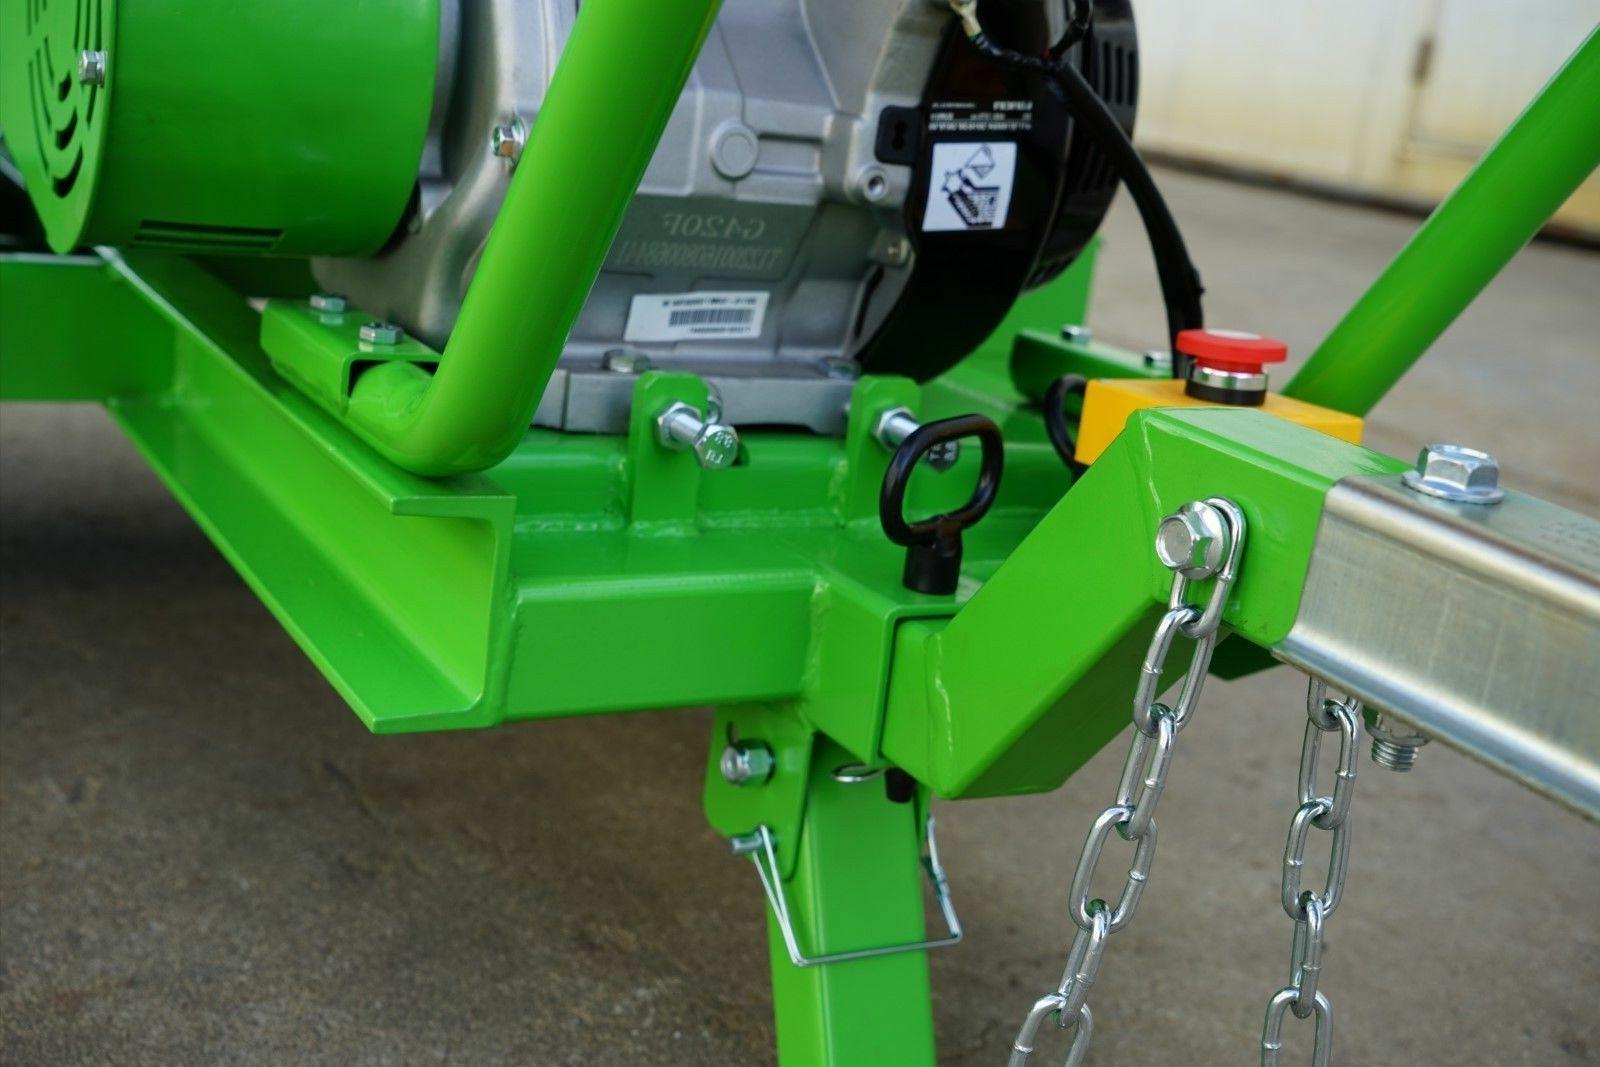 Nova Tractor chipper shredder Mulcher GTS1500 driven by Briggs